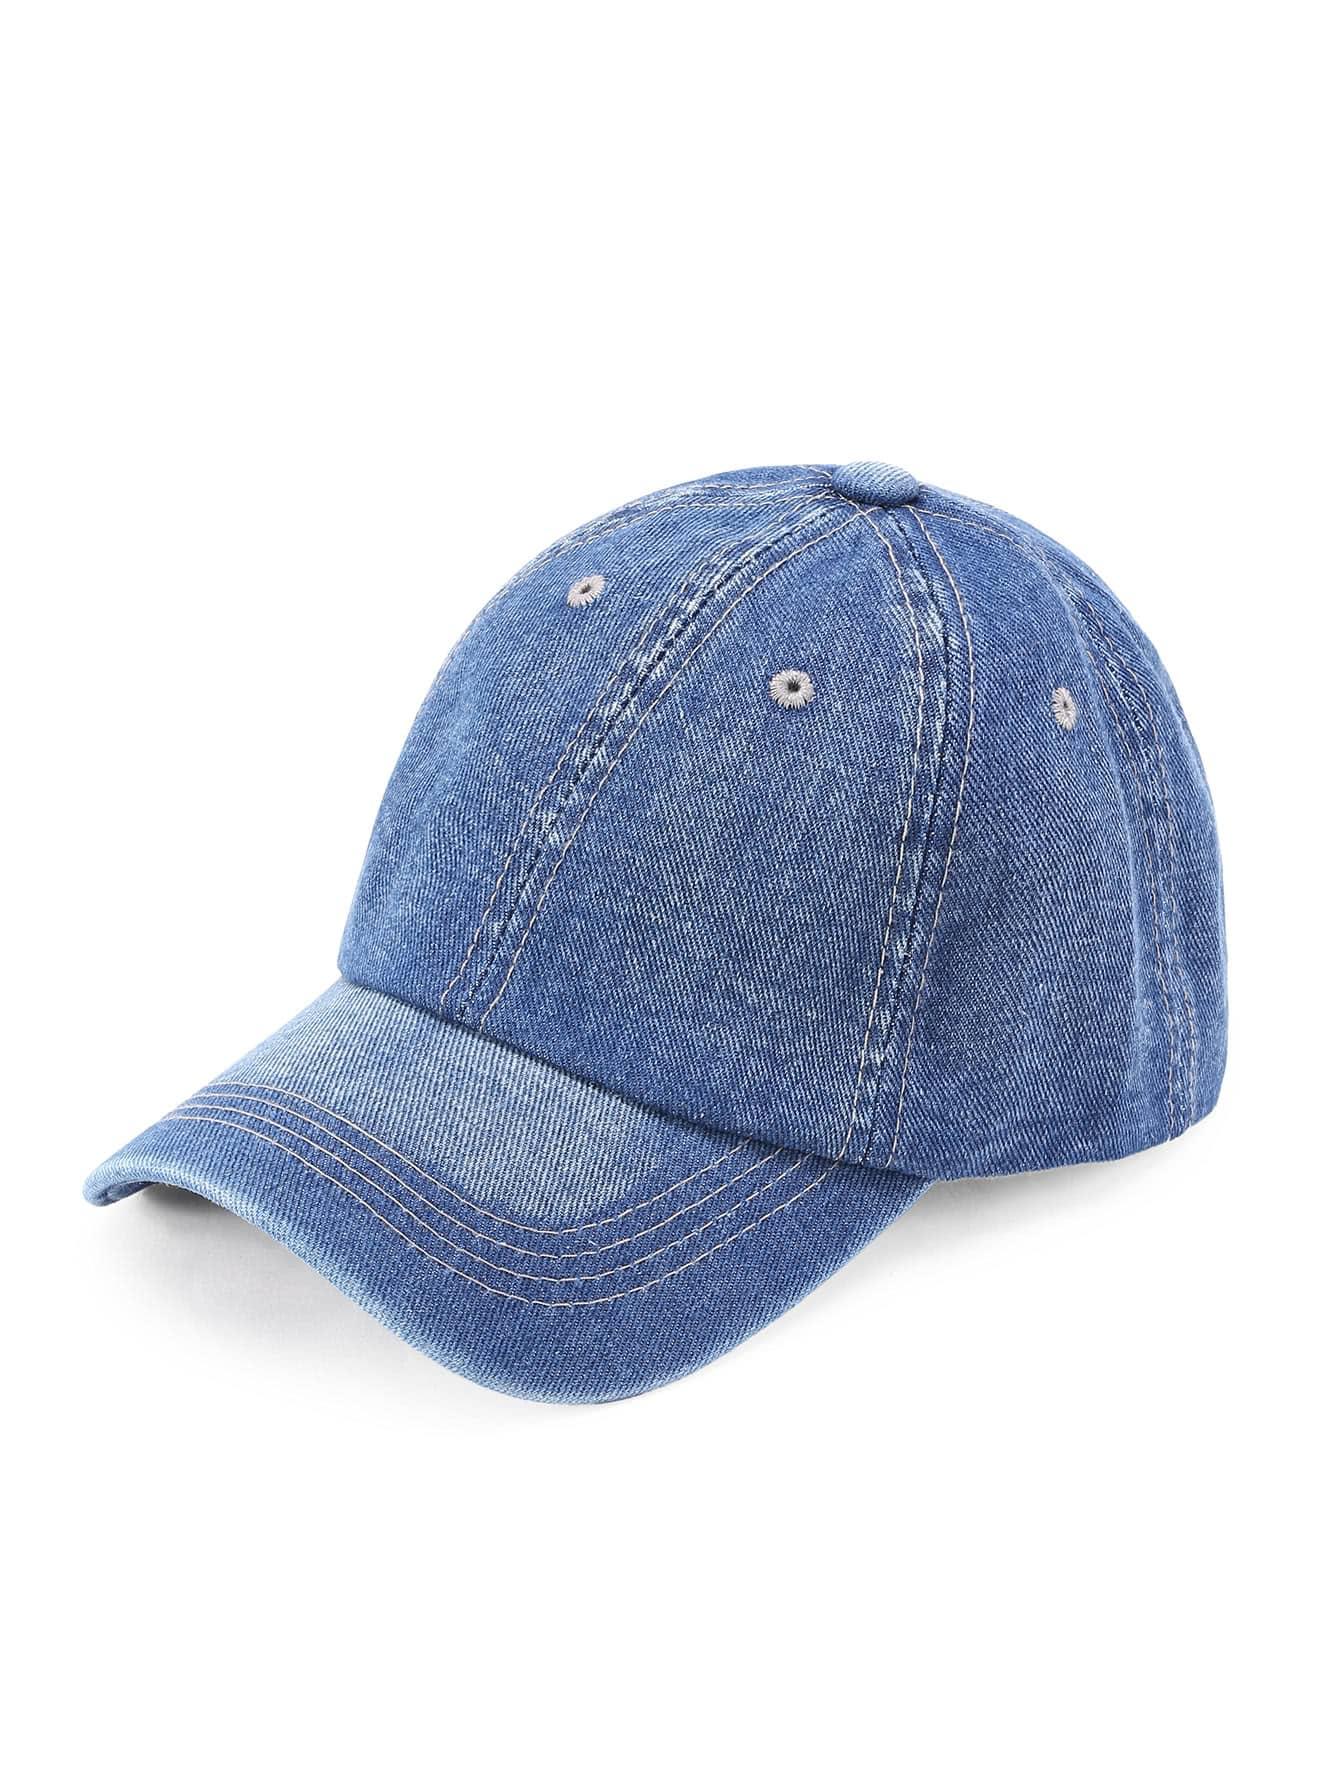 Denim Baseball Cap hat170608302